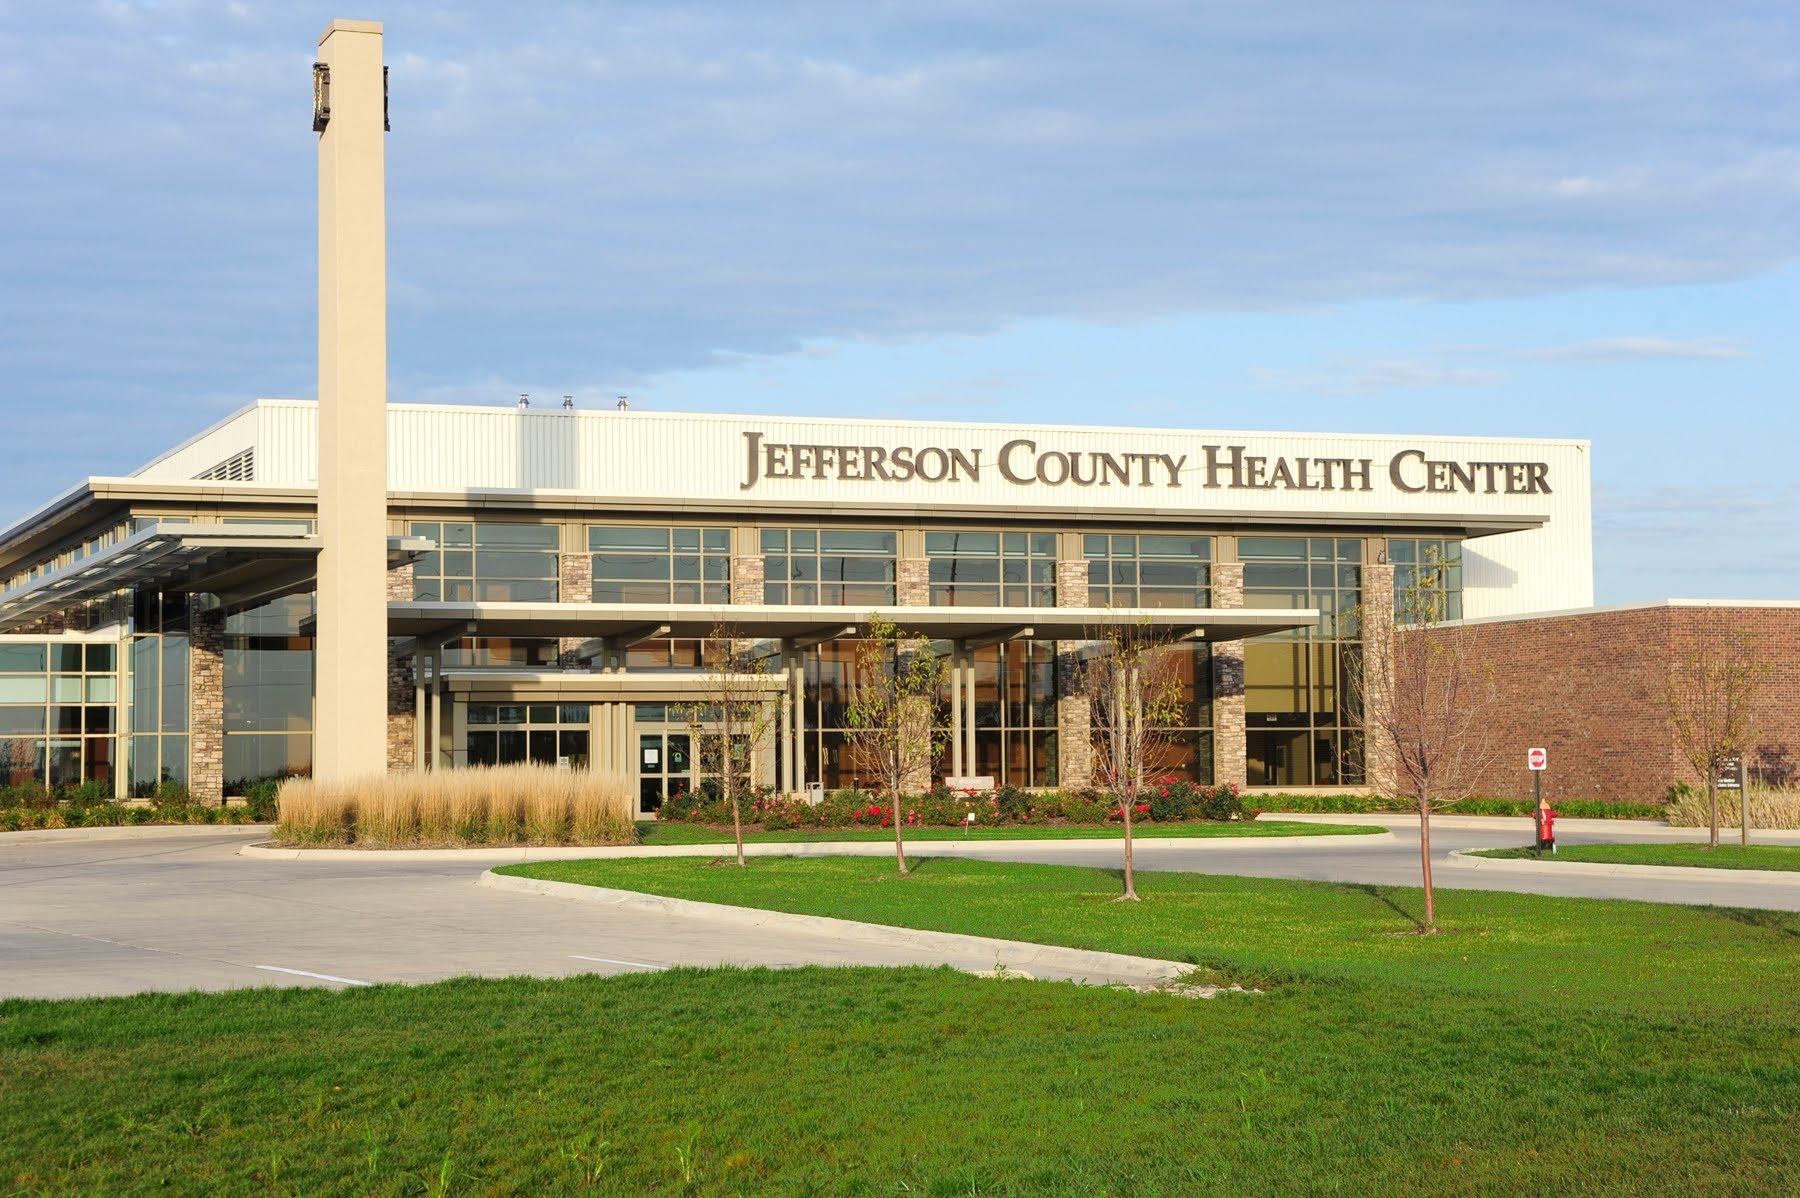 Jefferson County Hospital